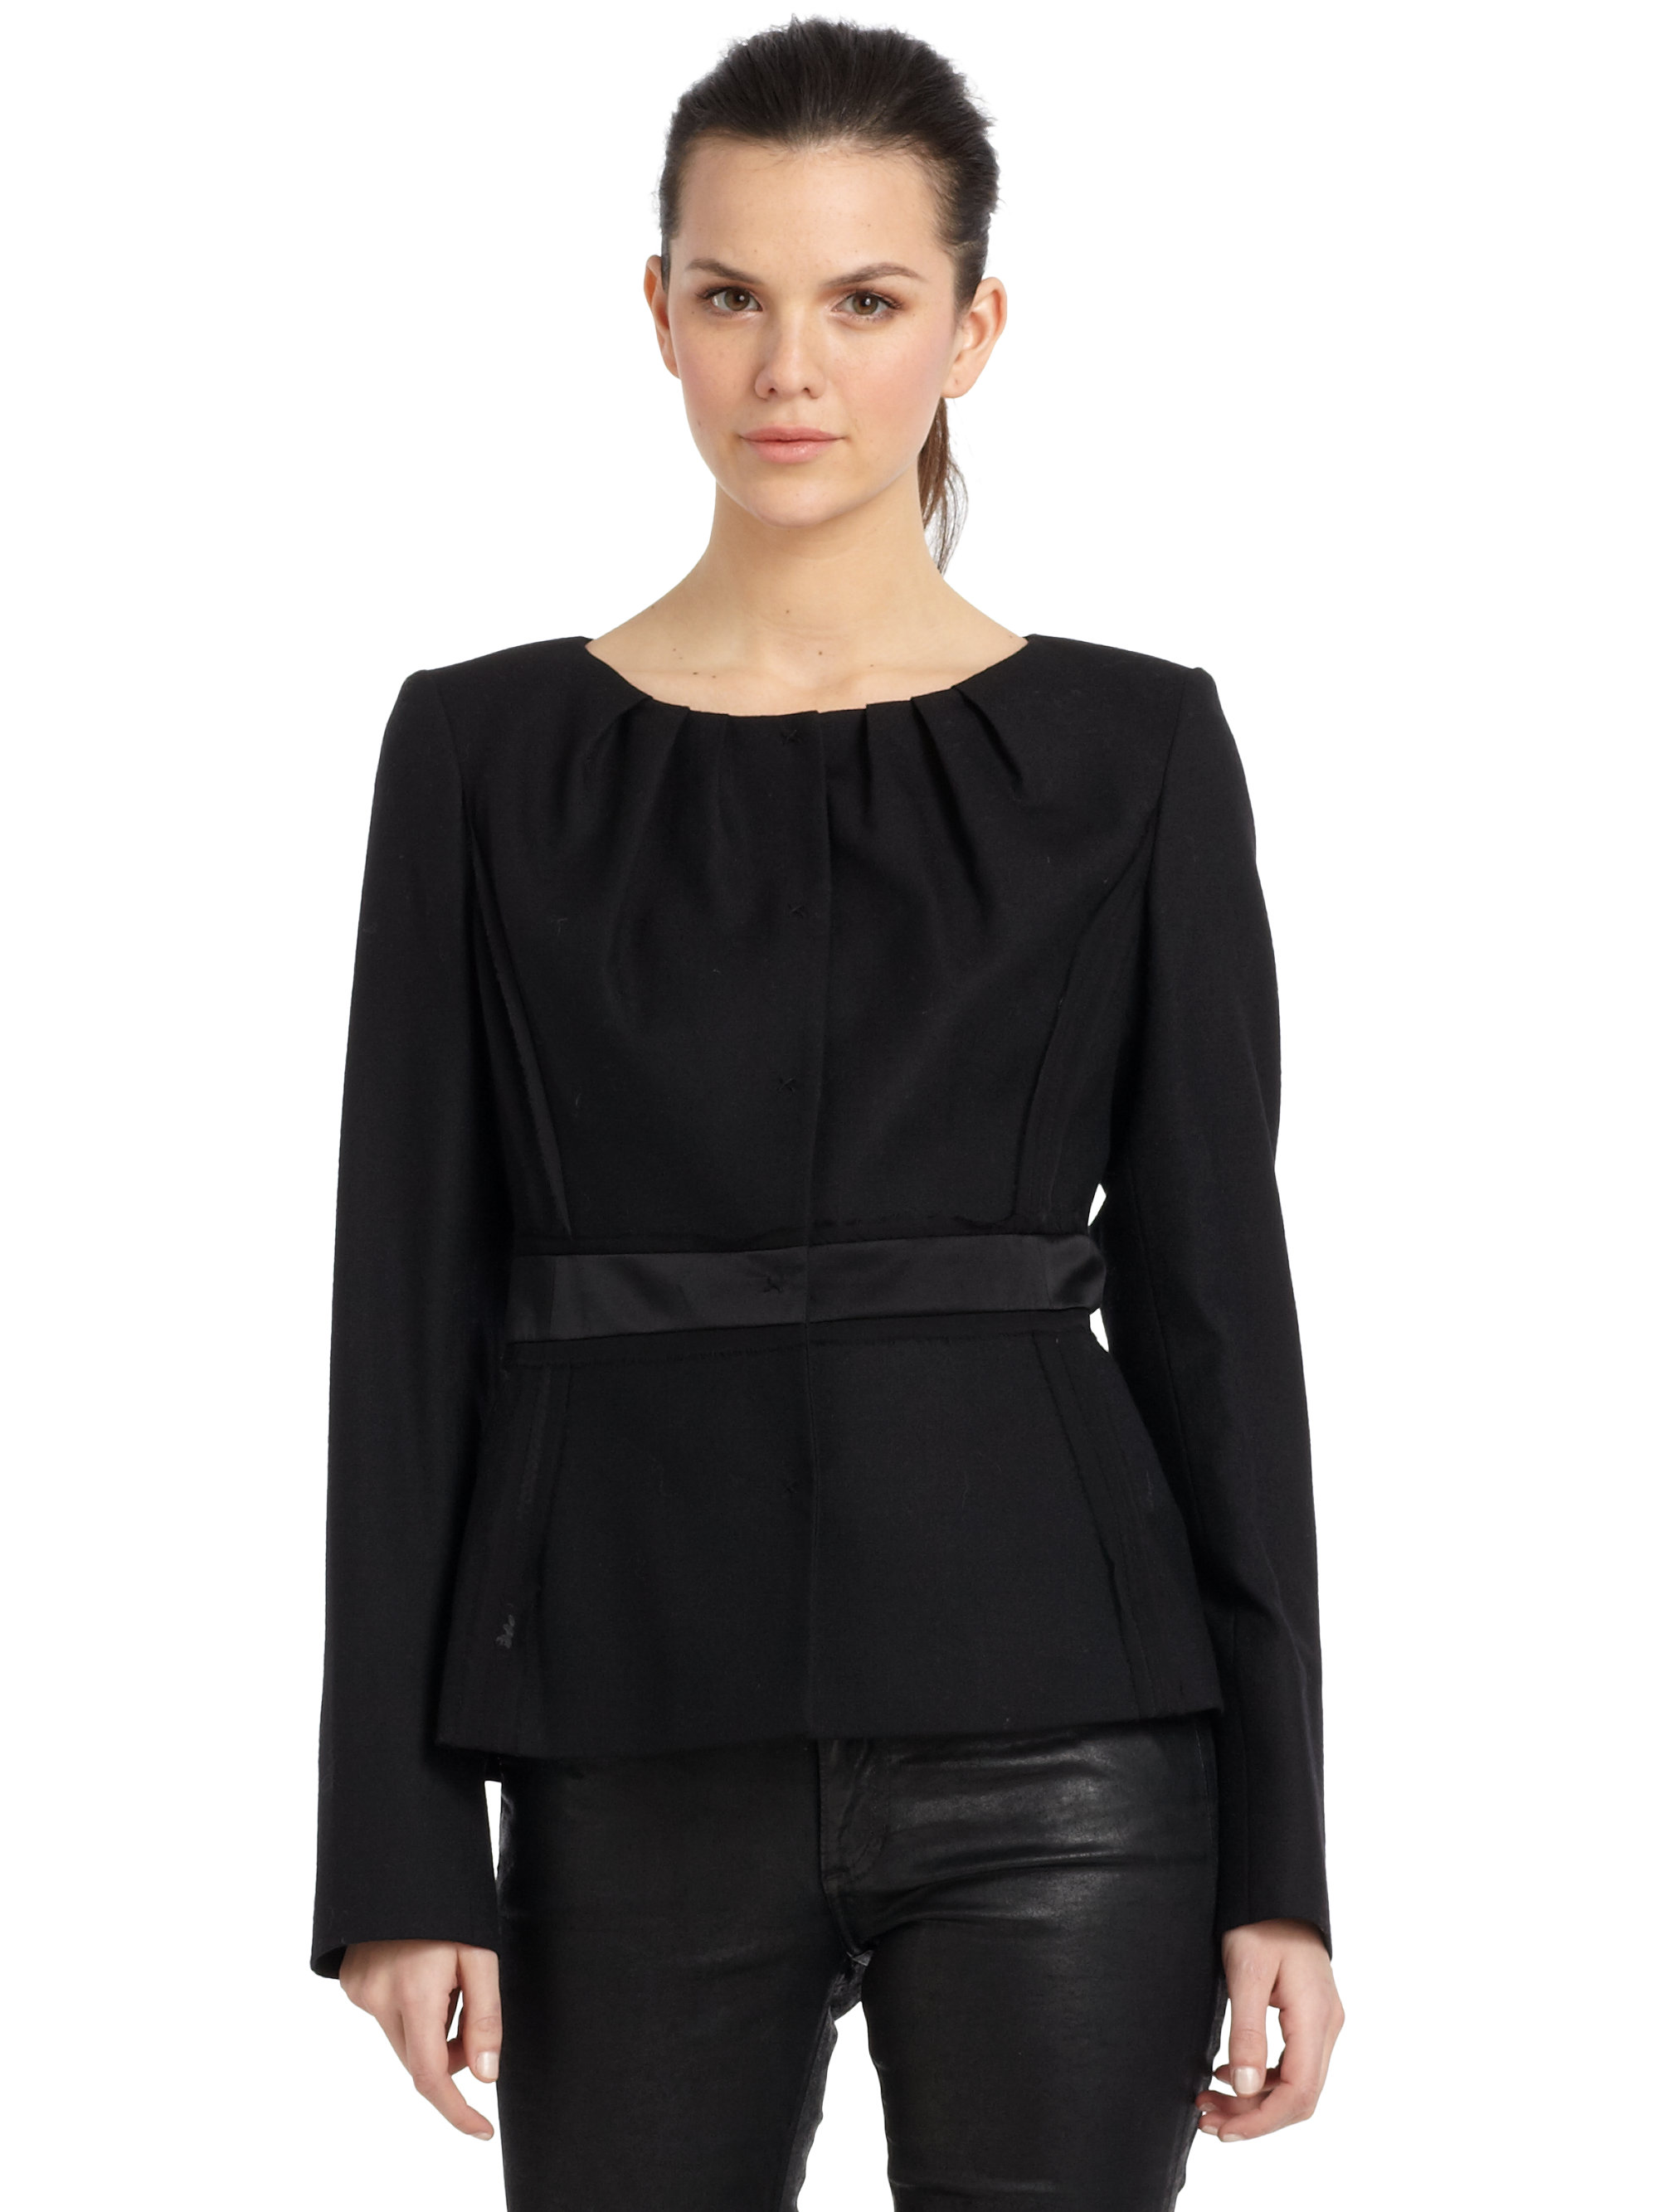 philosophy-di-alberta-ferretti-brown-pleated-neck-wool-blend-jacketbrown-product-1-7642903-324092156.jpeg